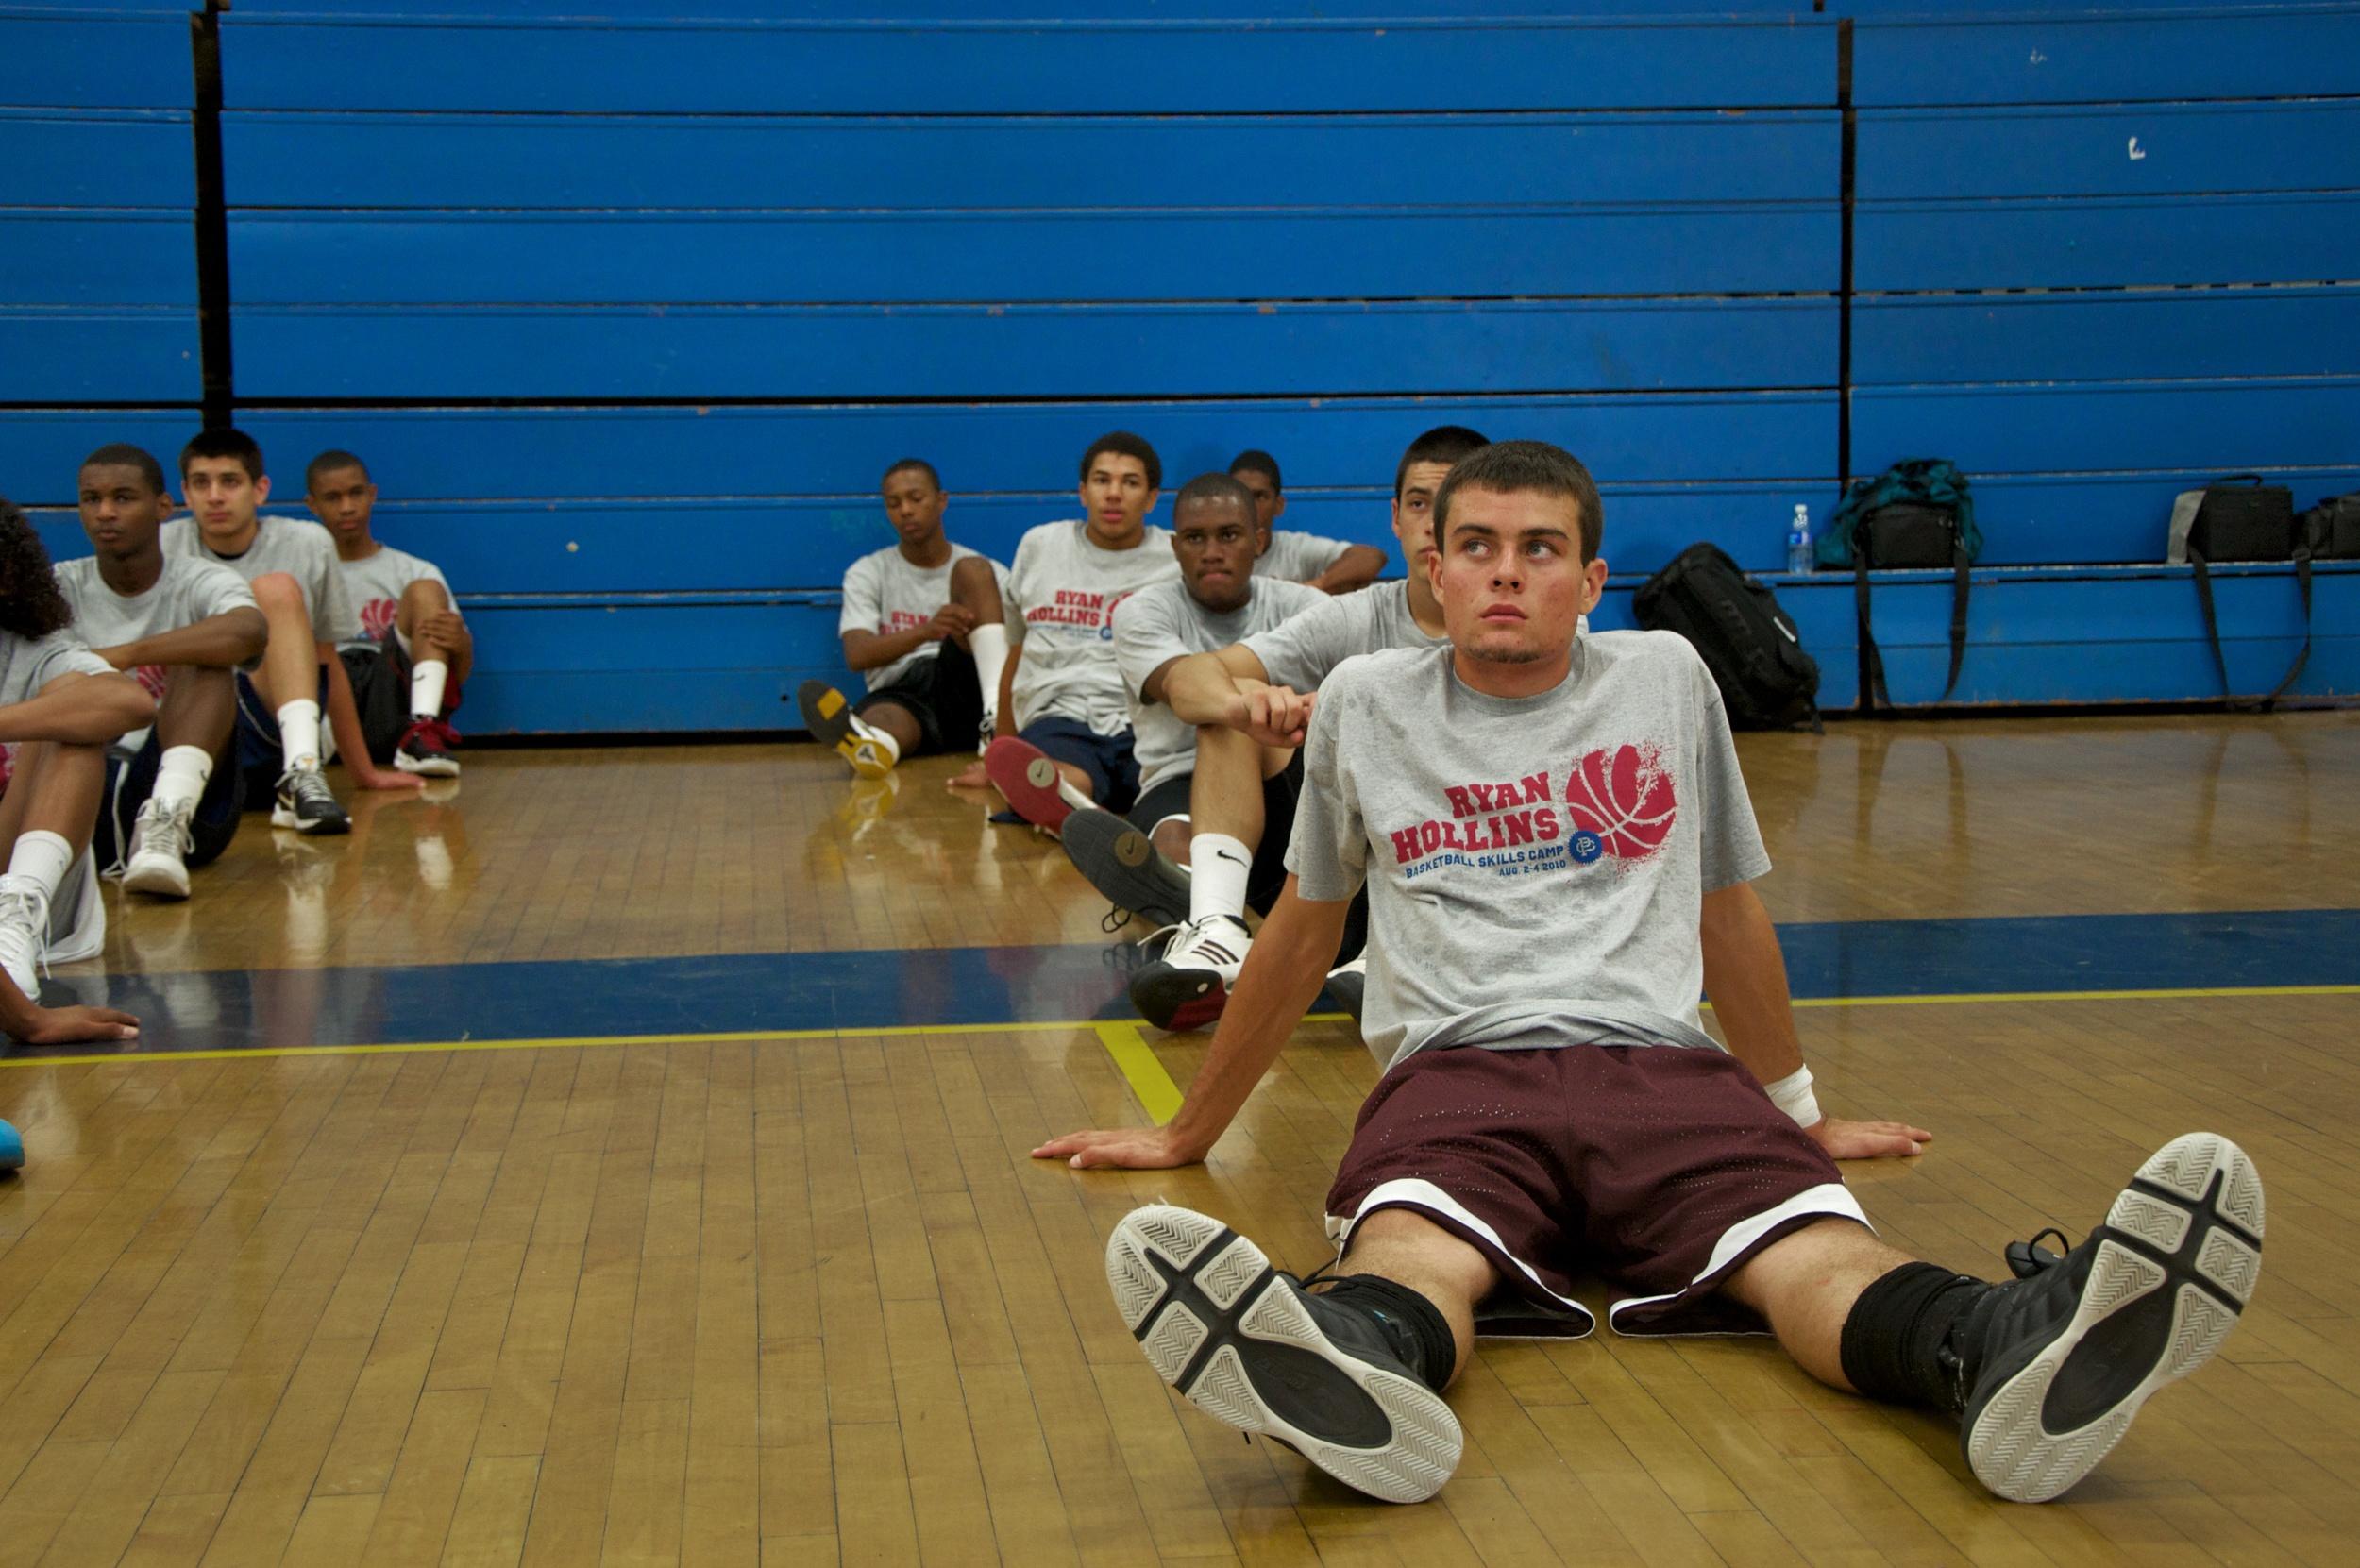 Ryan Hollins Basketball Camp 11.jpg